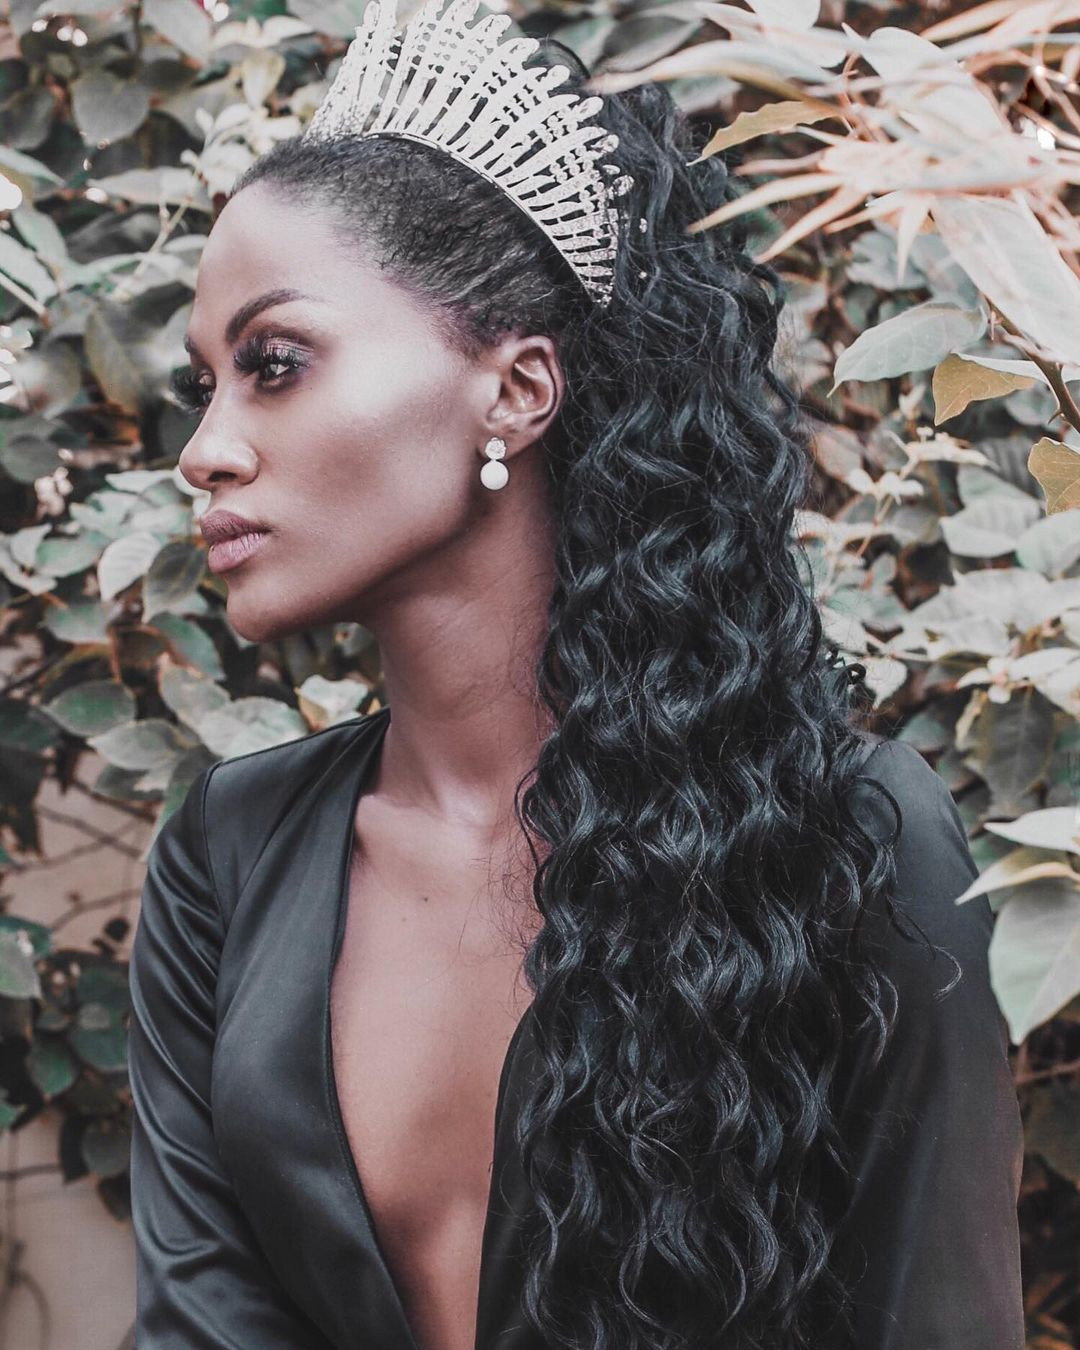 fernanda bispo, top 20 de miss brasil mundo 2019. - Página 5 F0do7f10